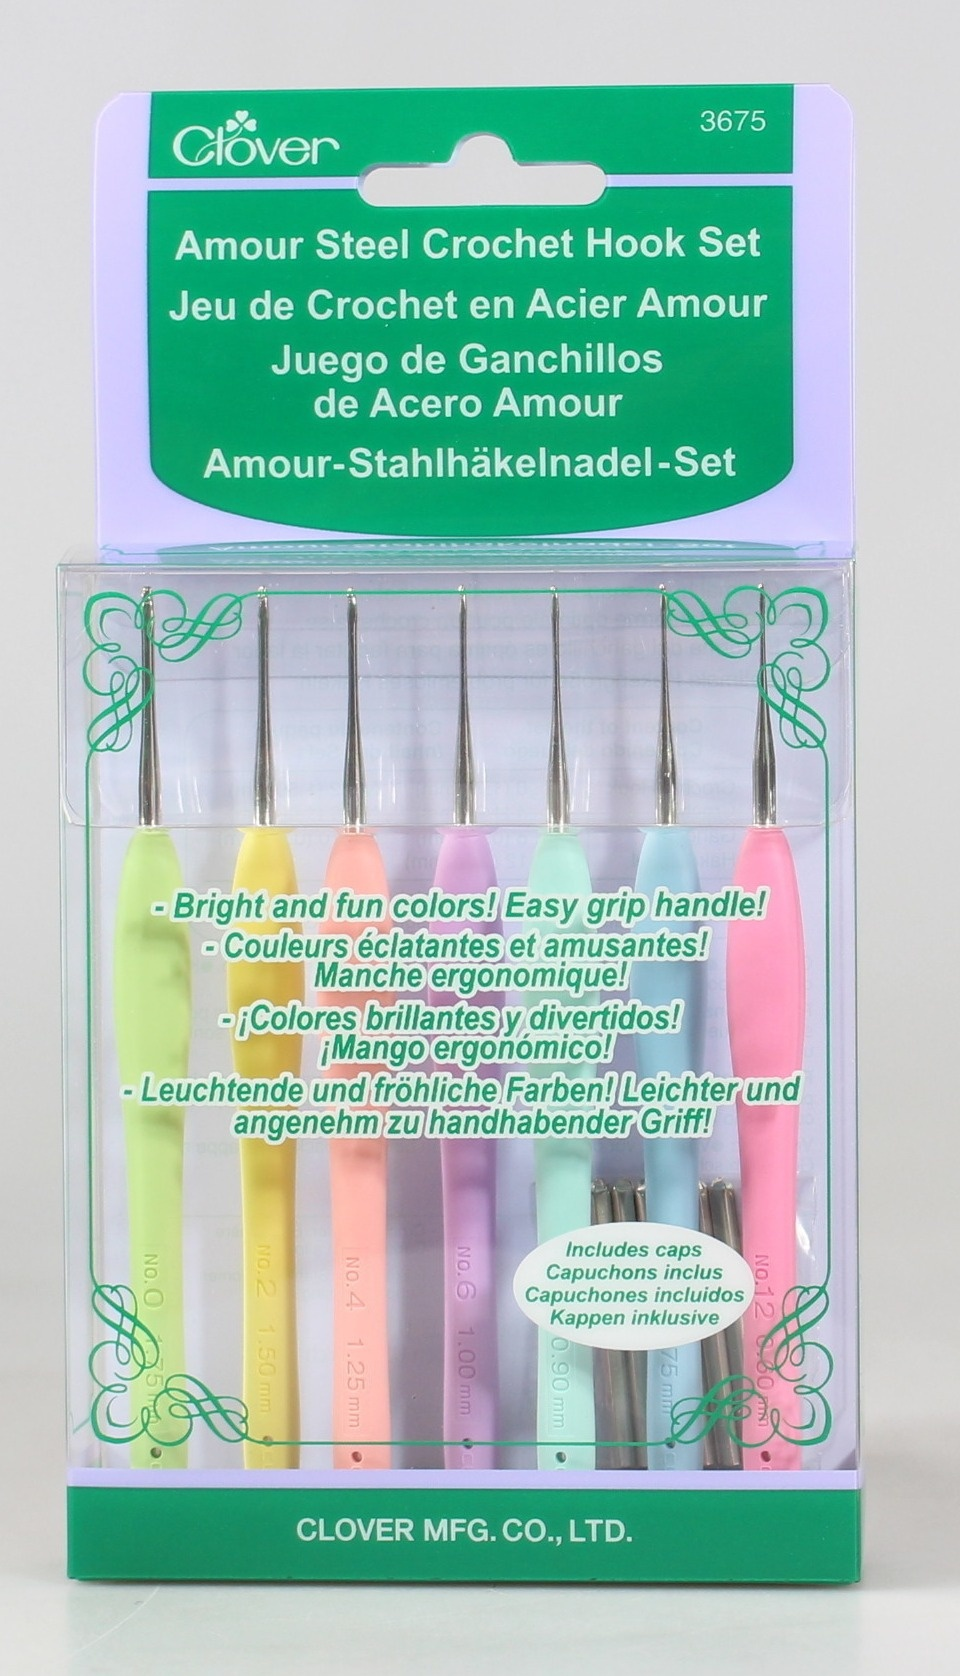 Clover Amour Steel Crochet Hook Set By Clover Shop Online For Arts